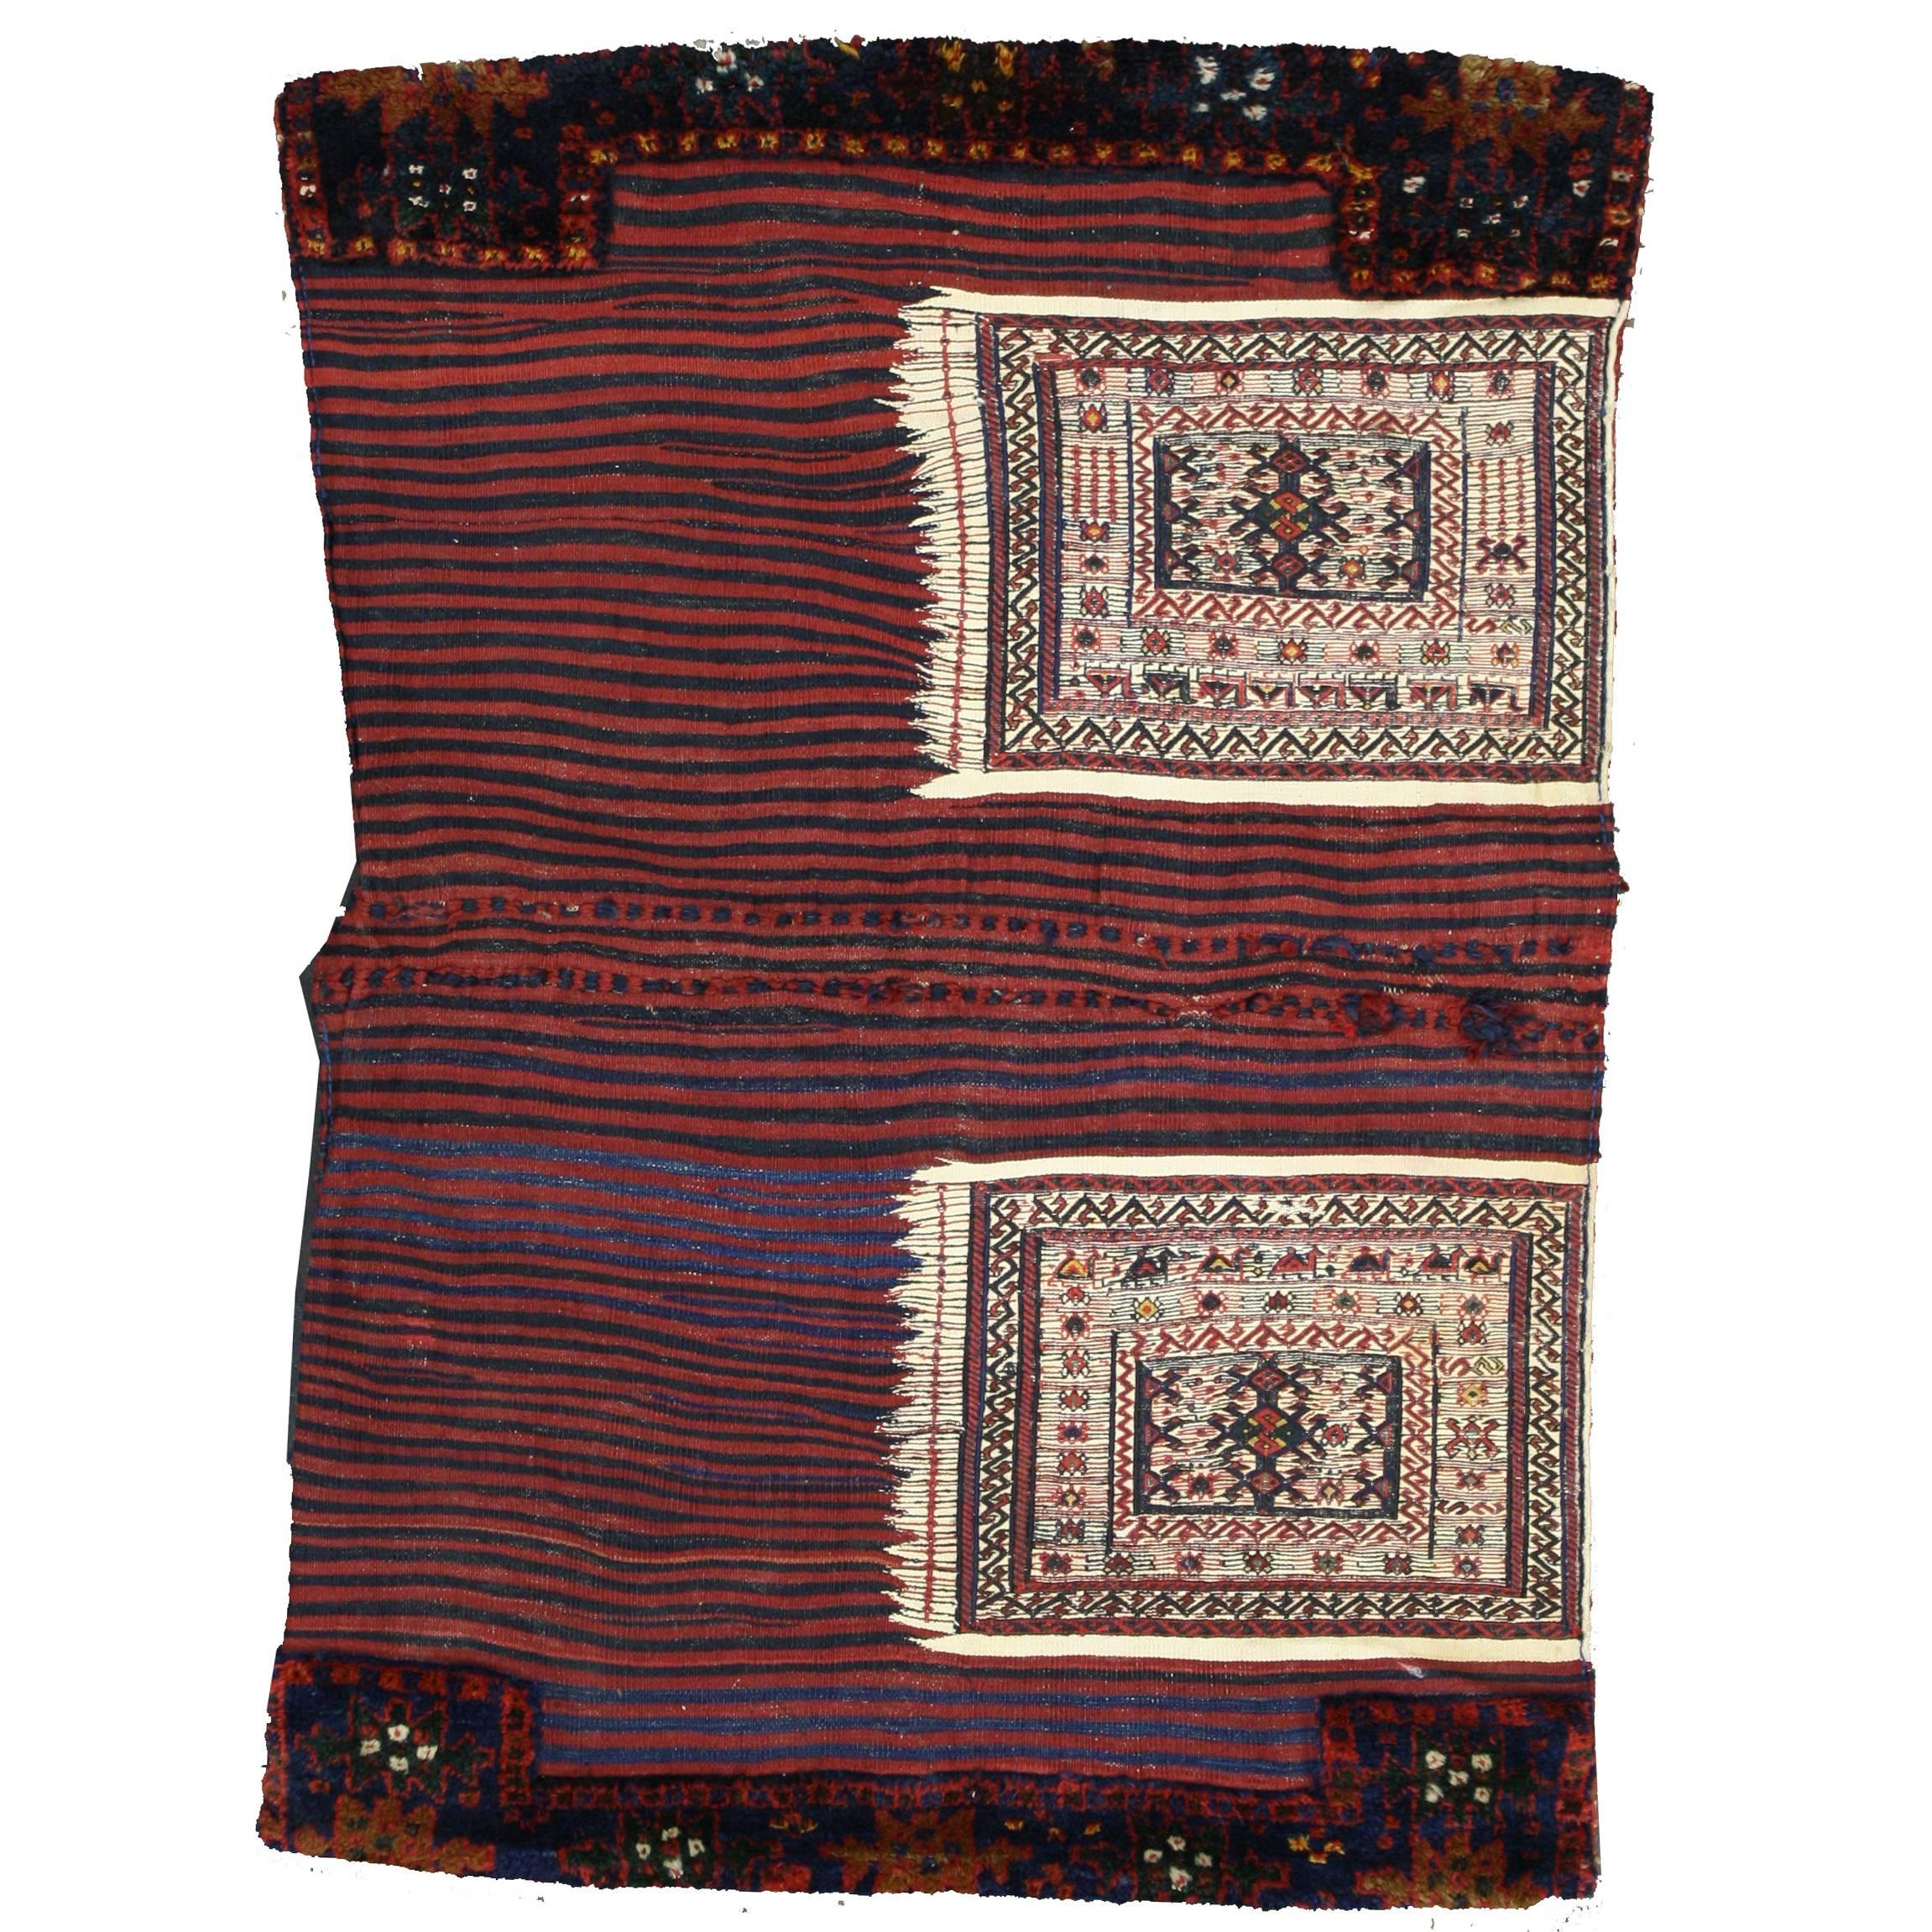 Antique Persian Soumak Saddlebag, Textile Art, Tribal Wall Hanging